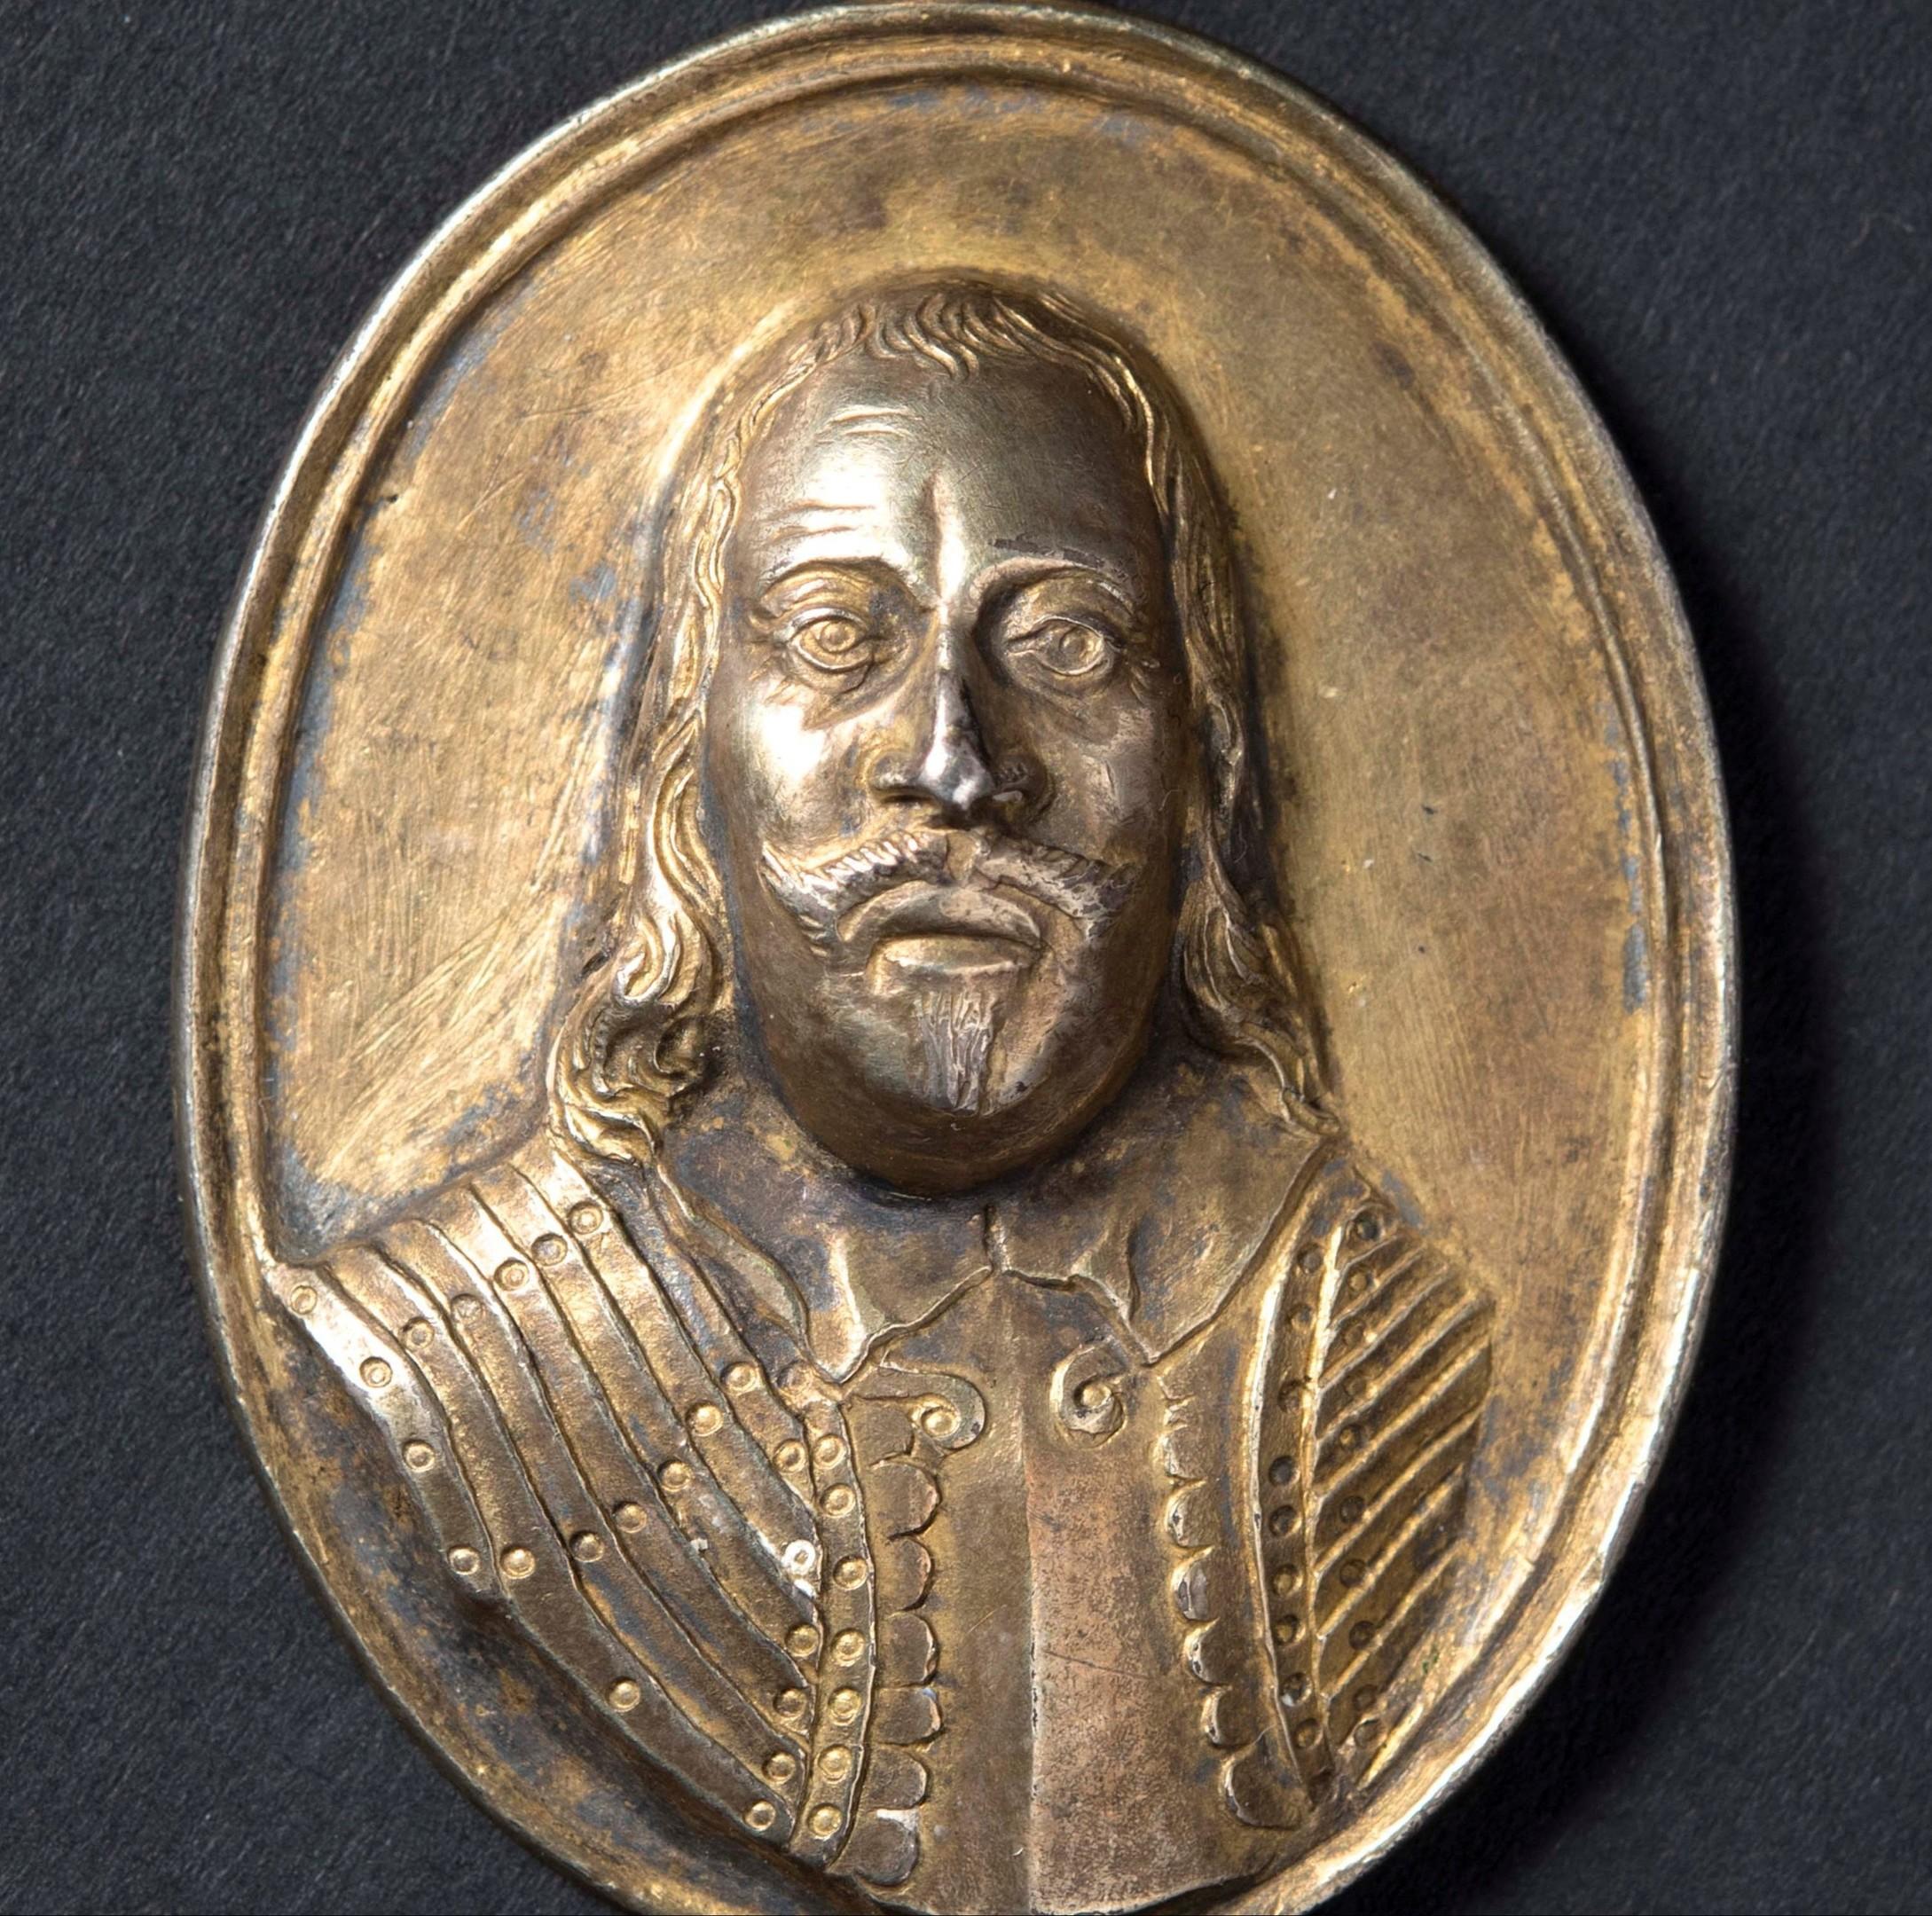 The Montrose medallion.